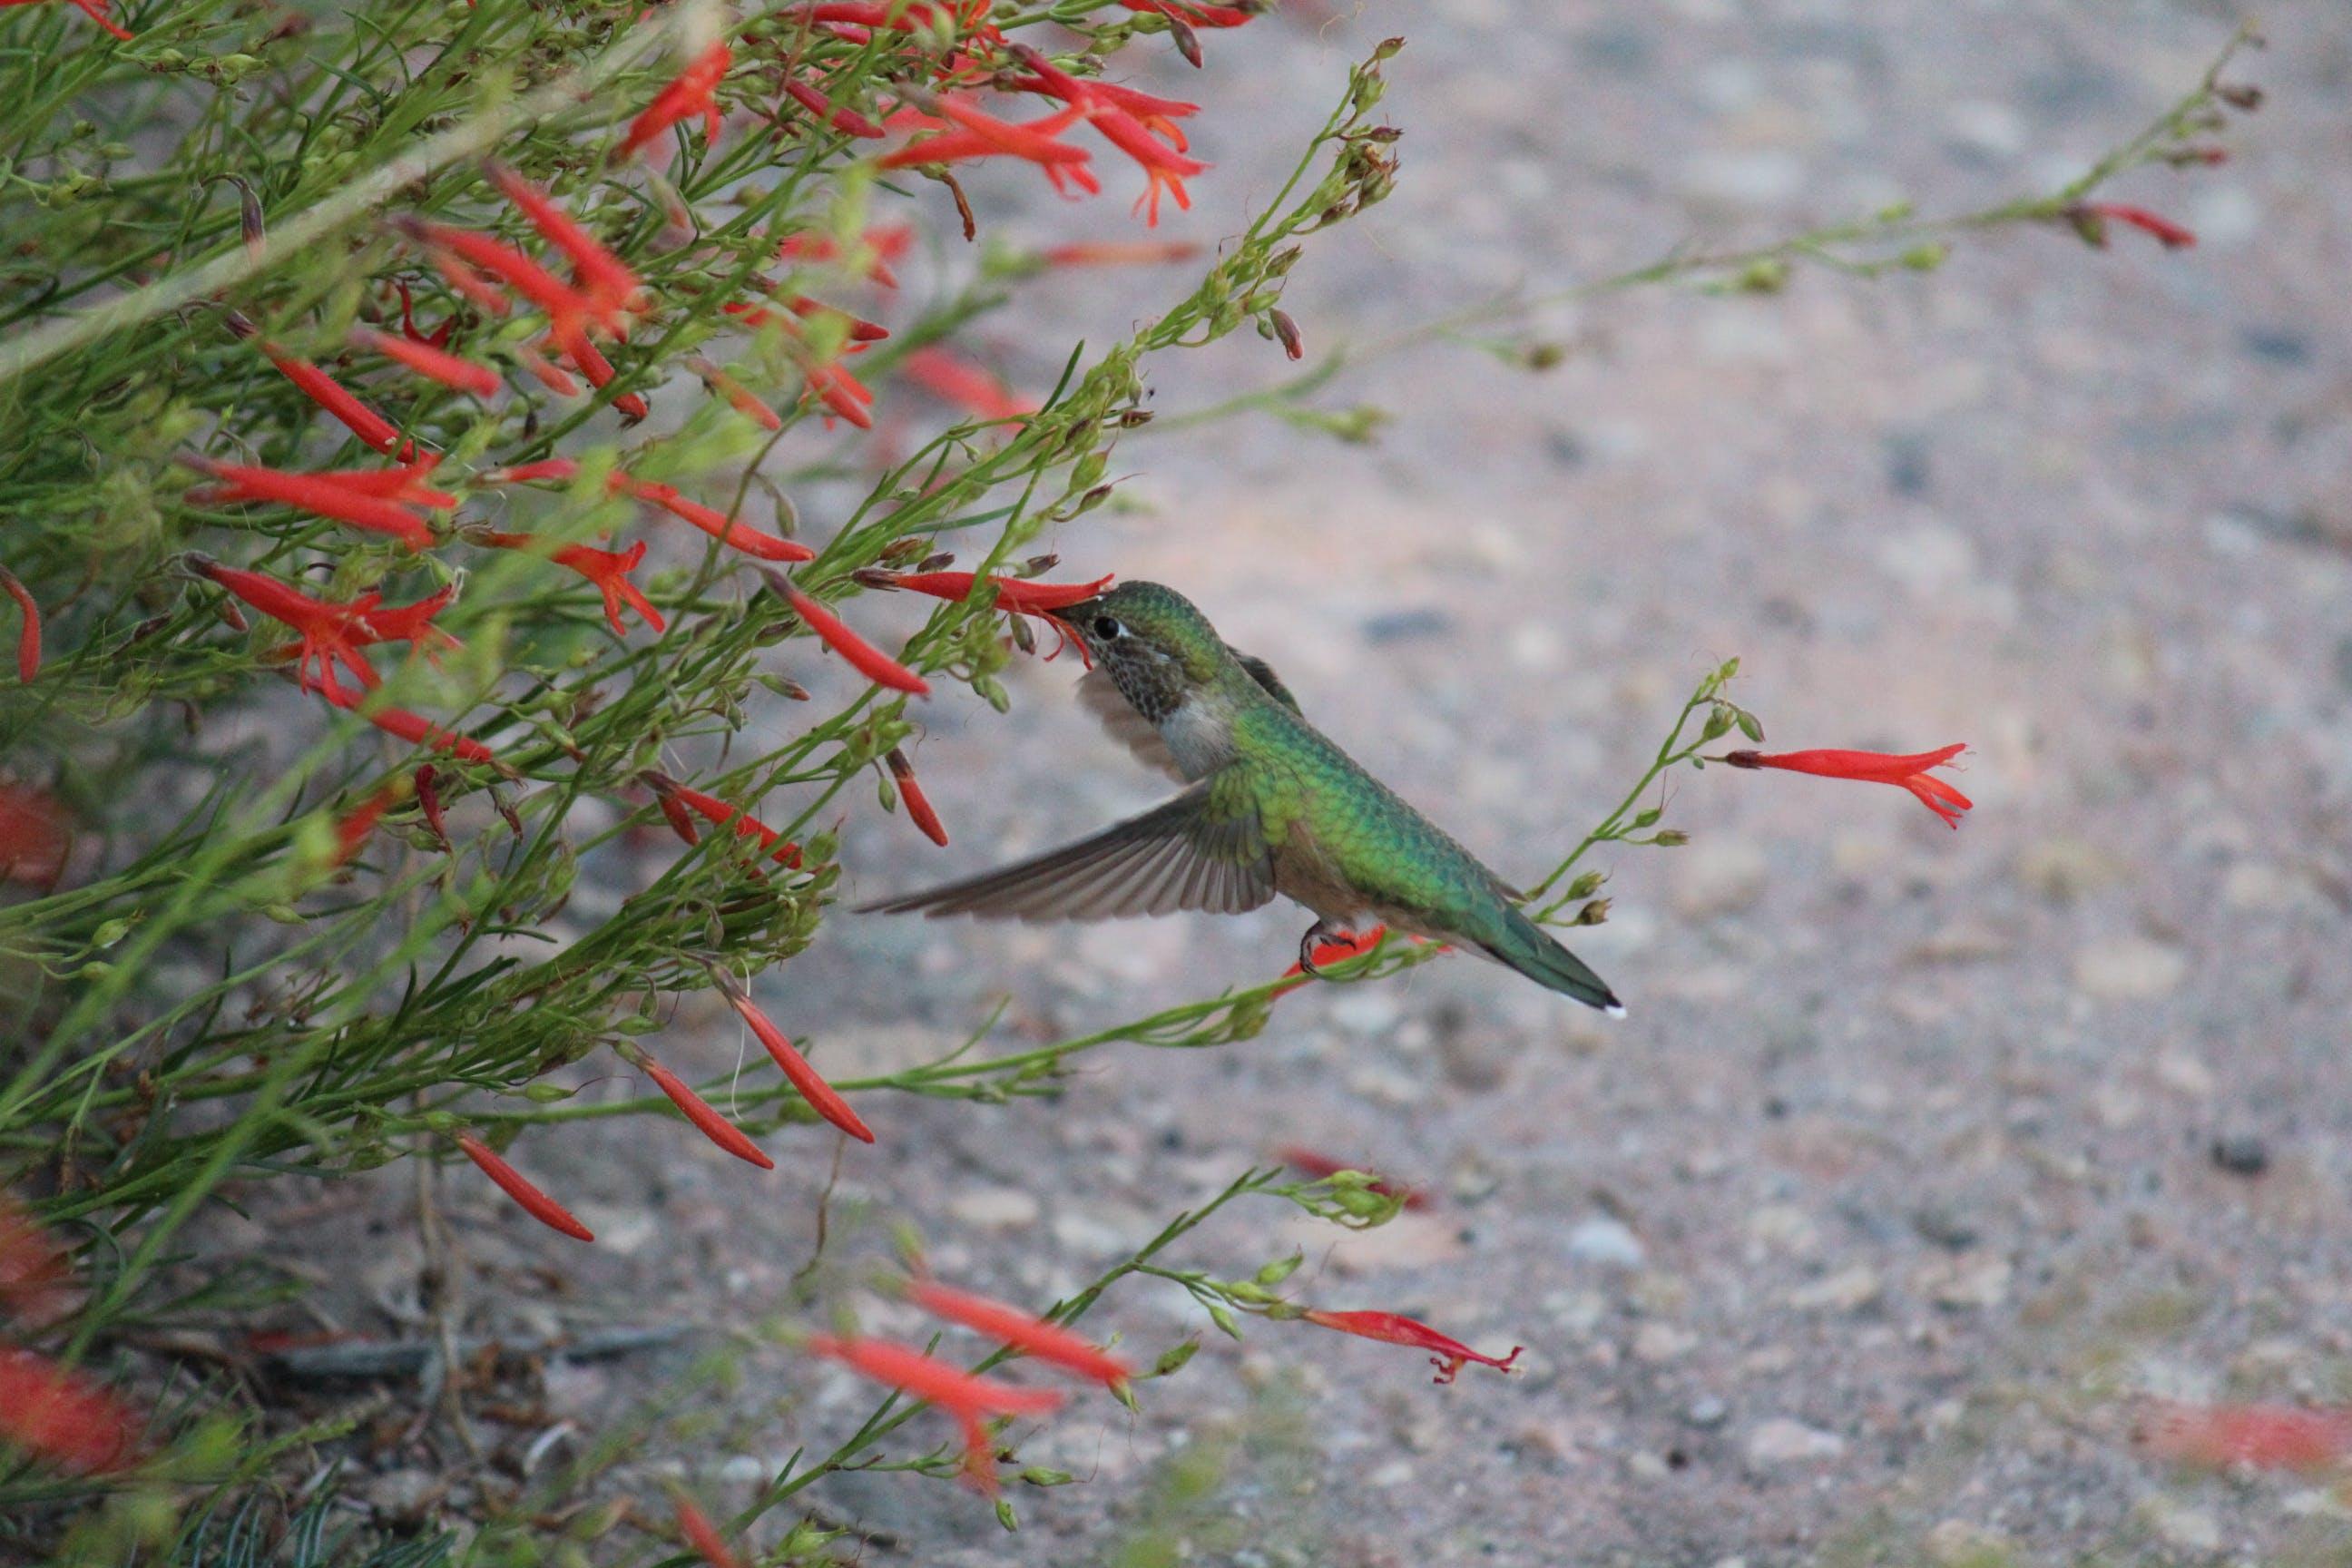 Broadtailed Hummingbird